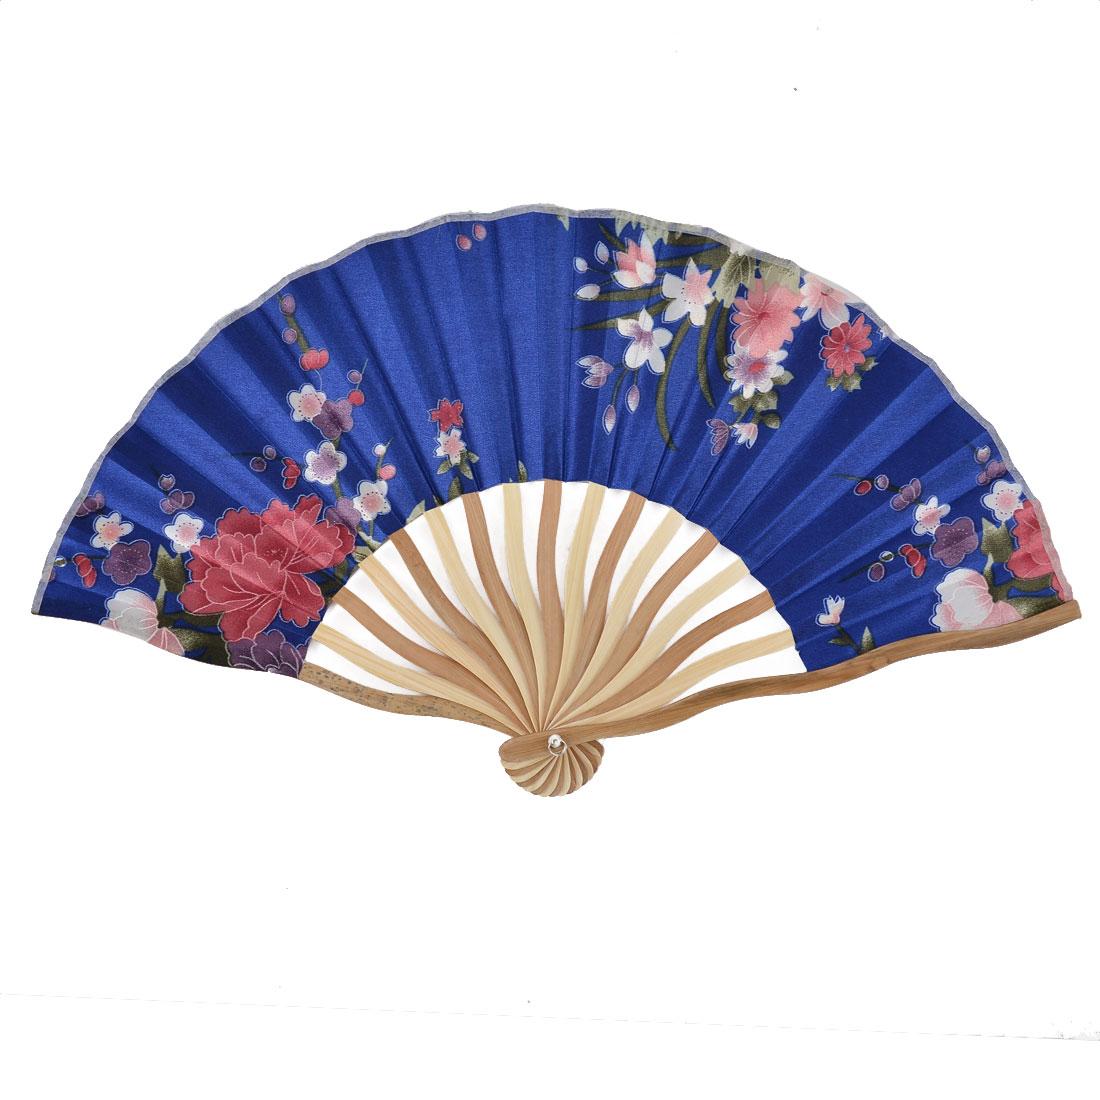 Bamboo Ribs Flower Pattern Summer Cool Portable Folding Hand Fan Blue w Pouch